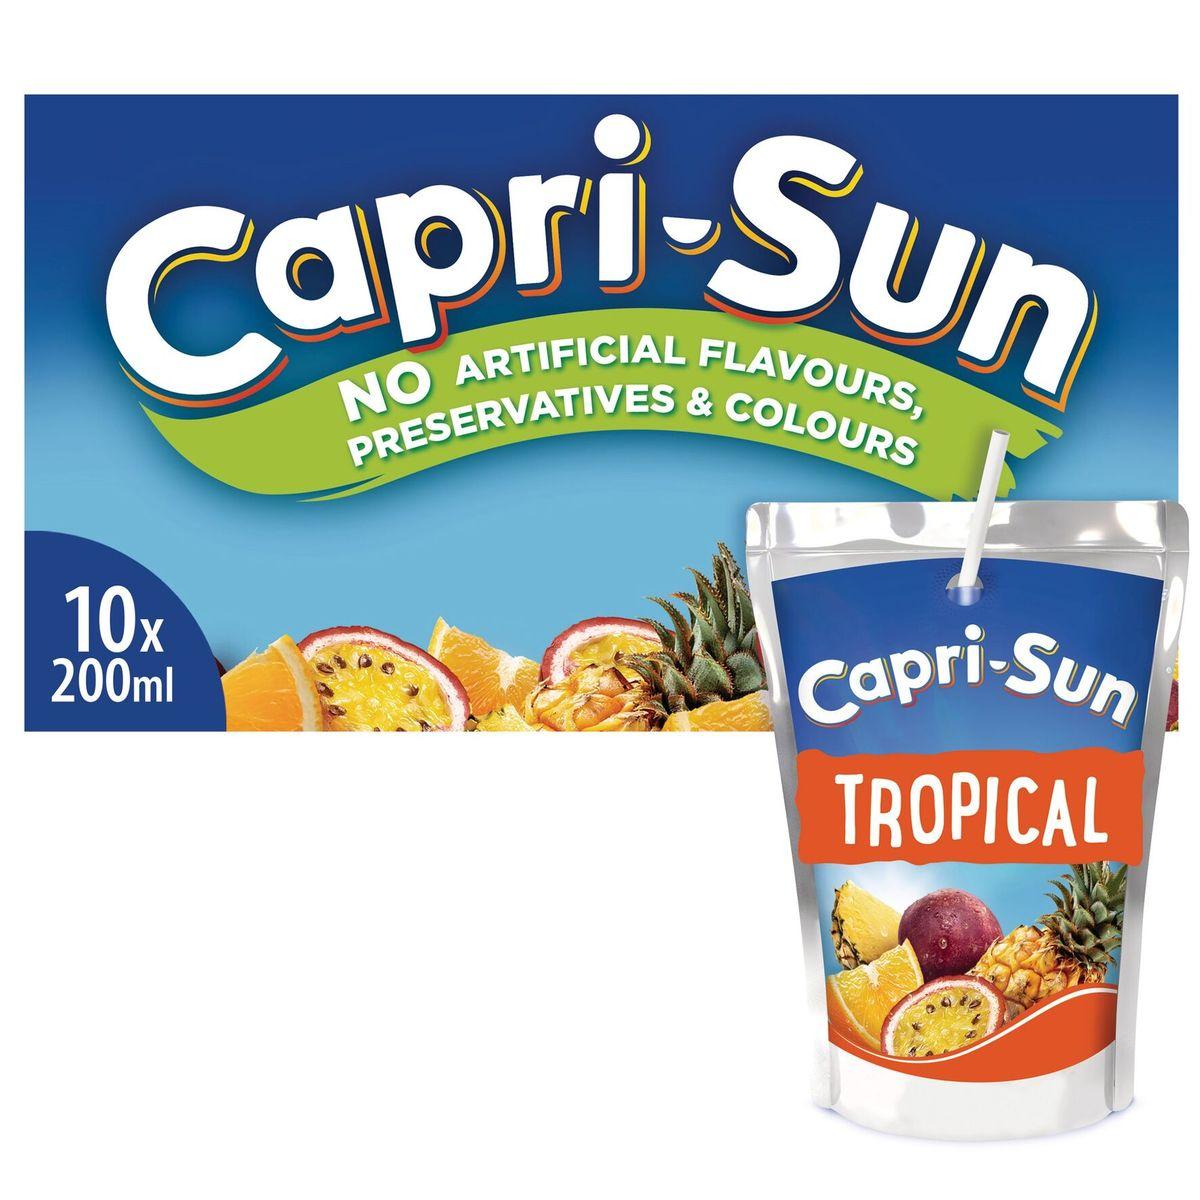 Capri-Sun Tropical 10 x 200 ml